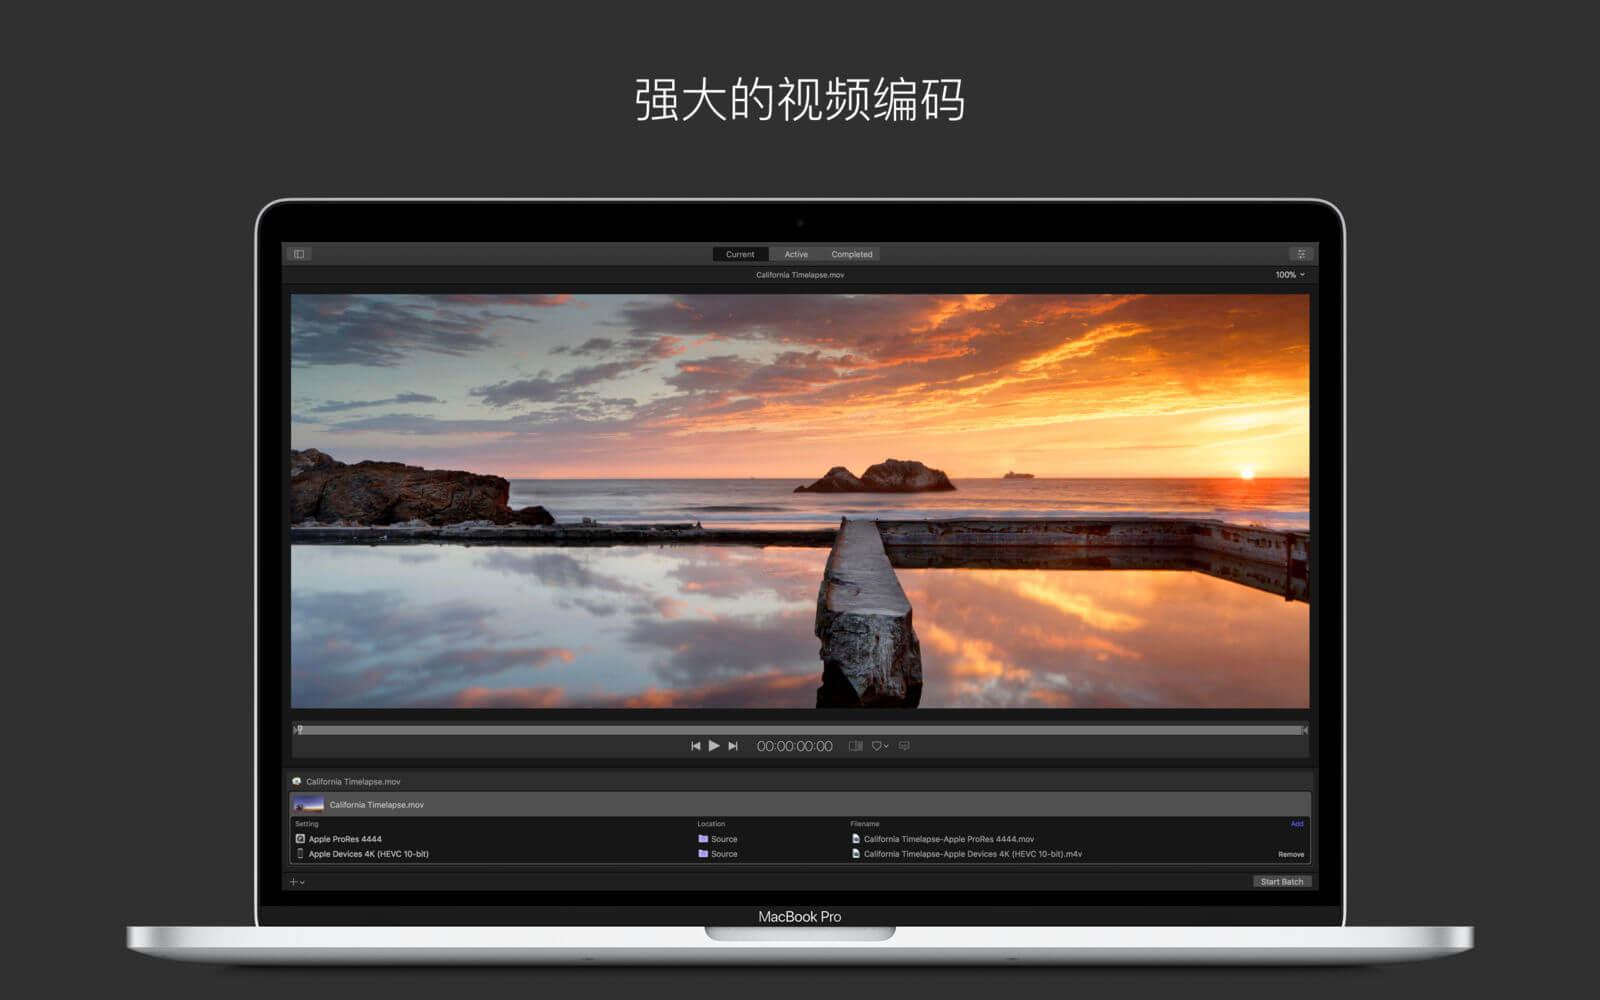 Apple Compressor 4.4.2 破解版免费下载 中英文版 苹果视频压缩编码转码输出软件